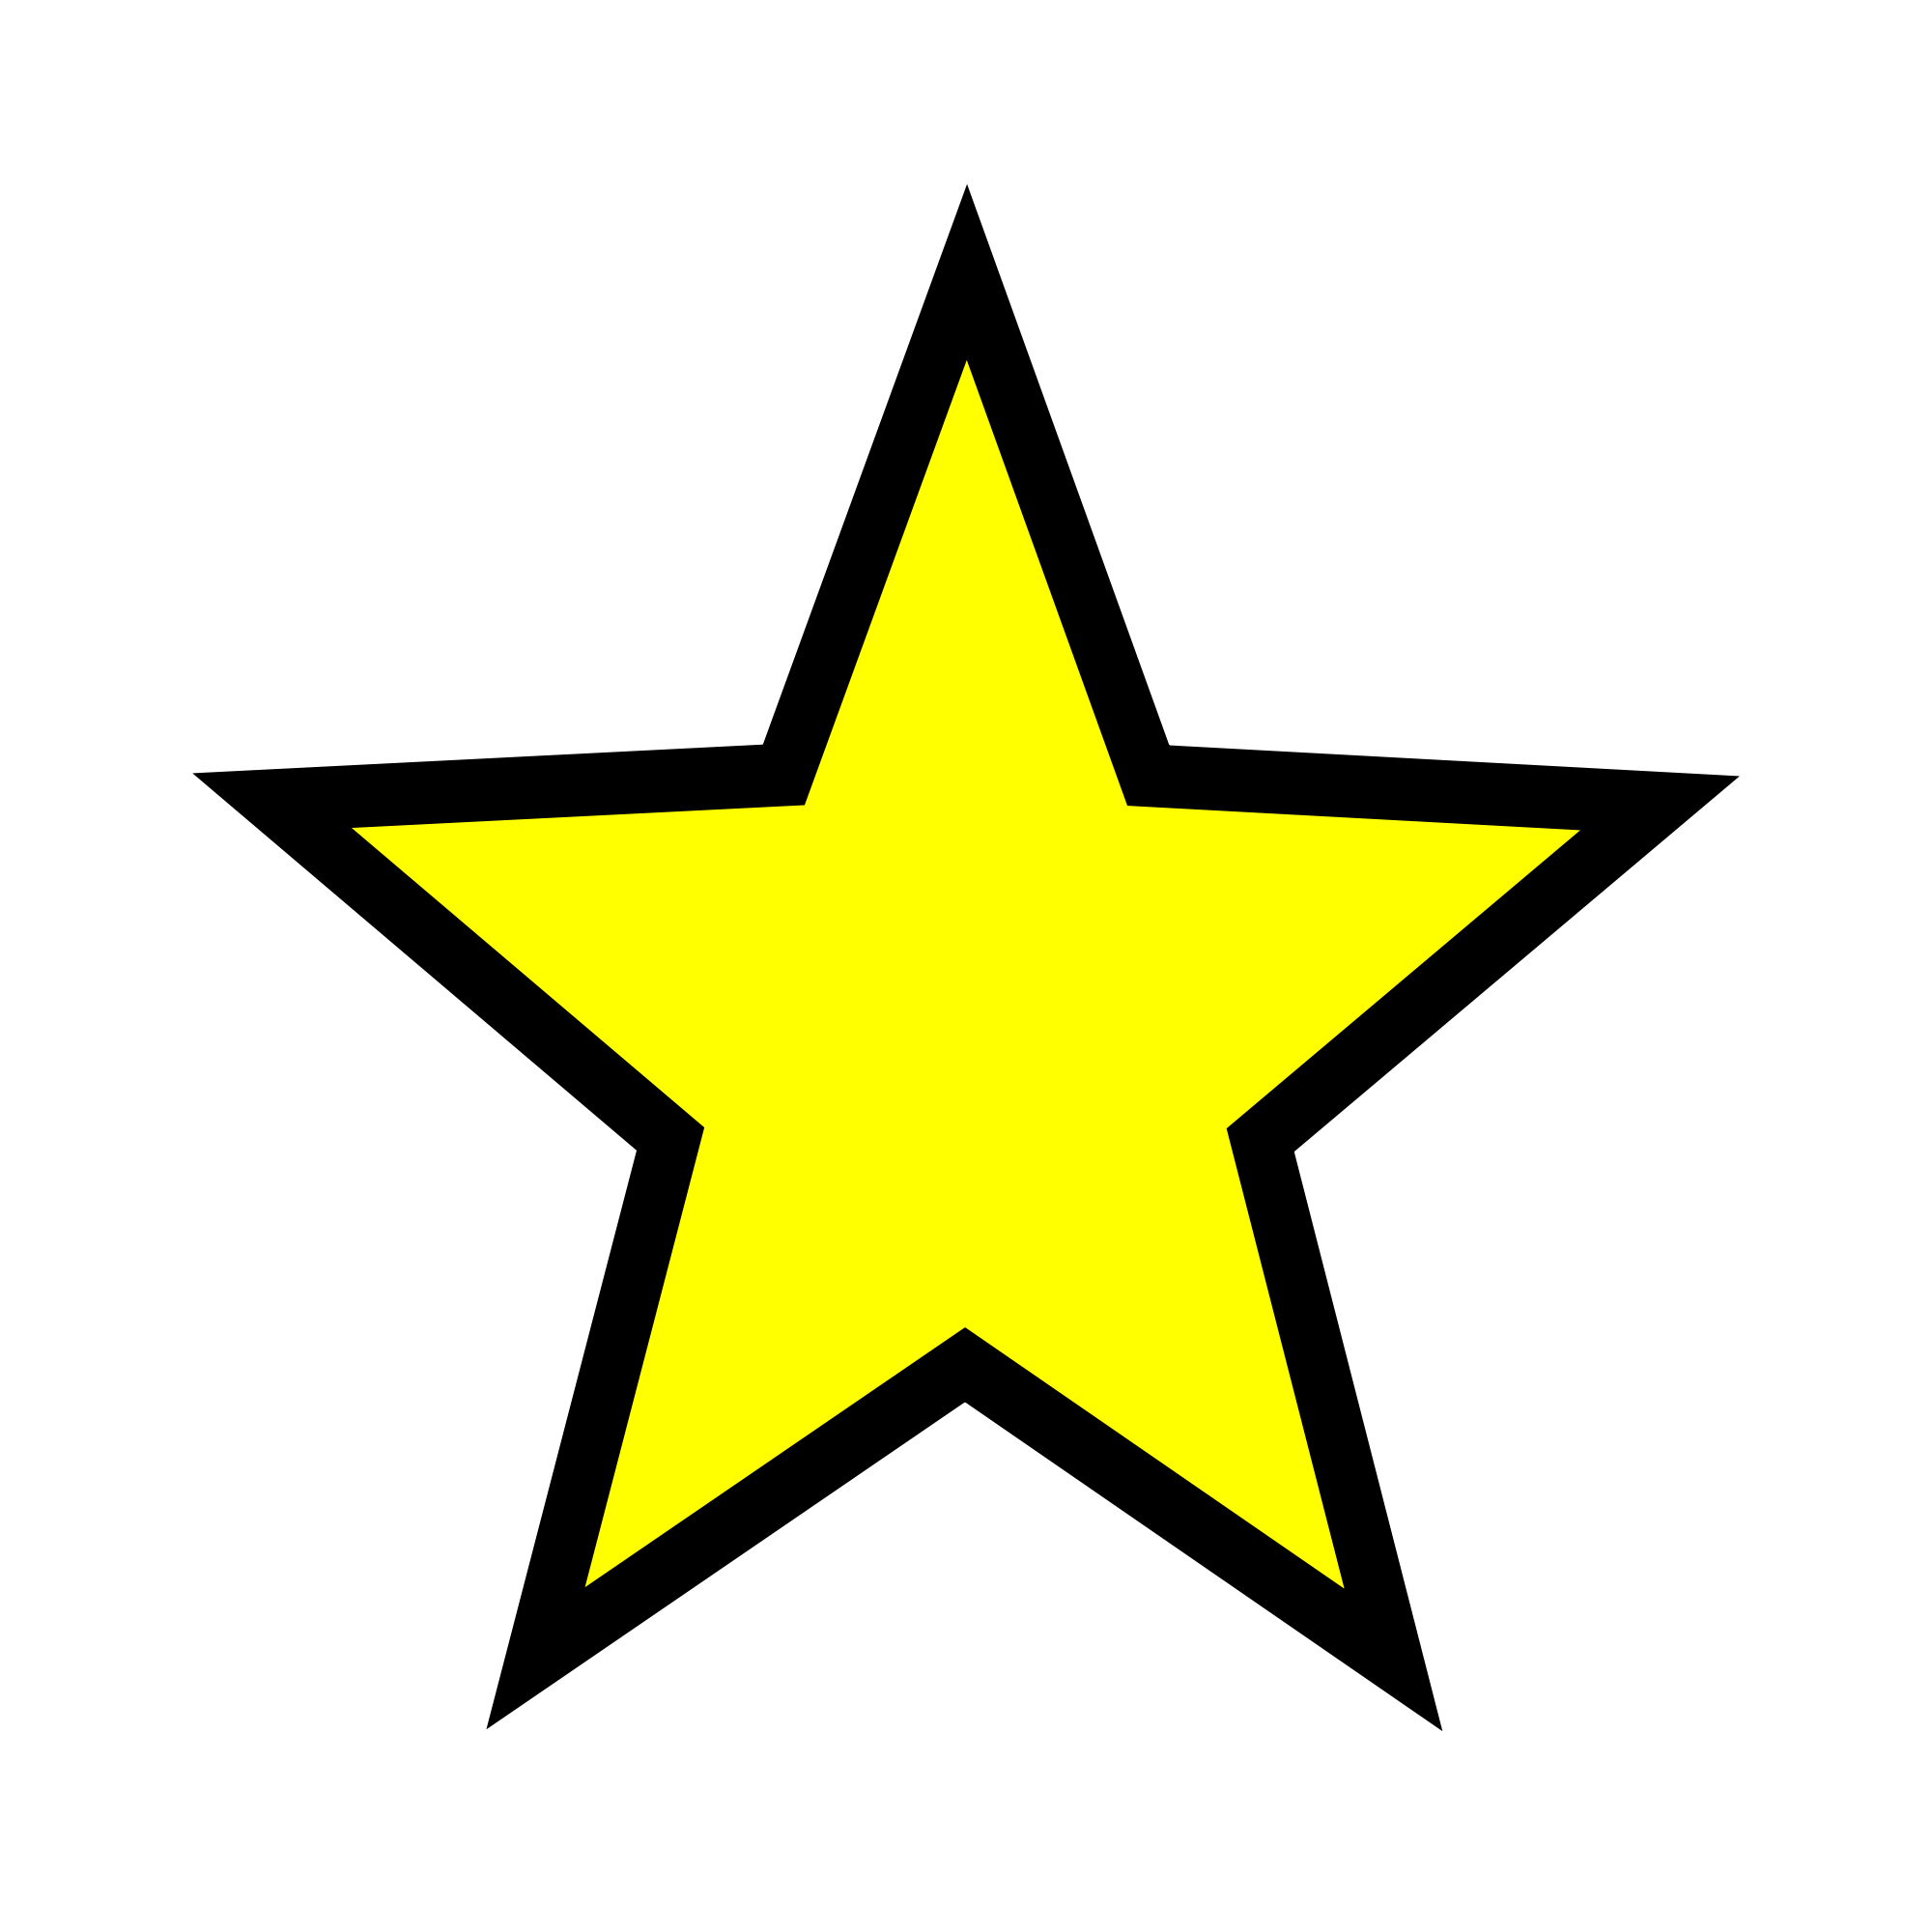 Sheriff star shape clipart clip art black and white Yellow Stars (45+) Desktop Backgrounds clip art black and white